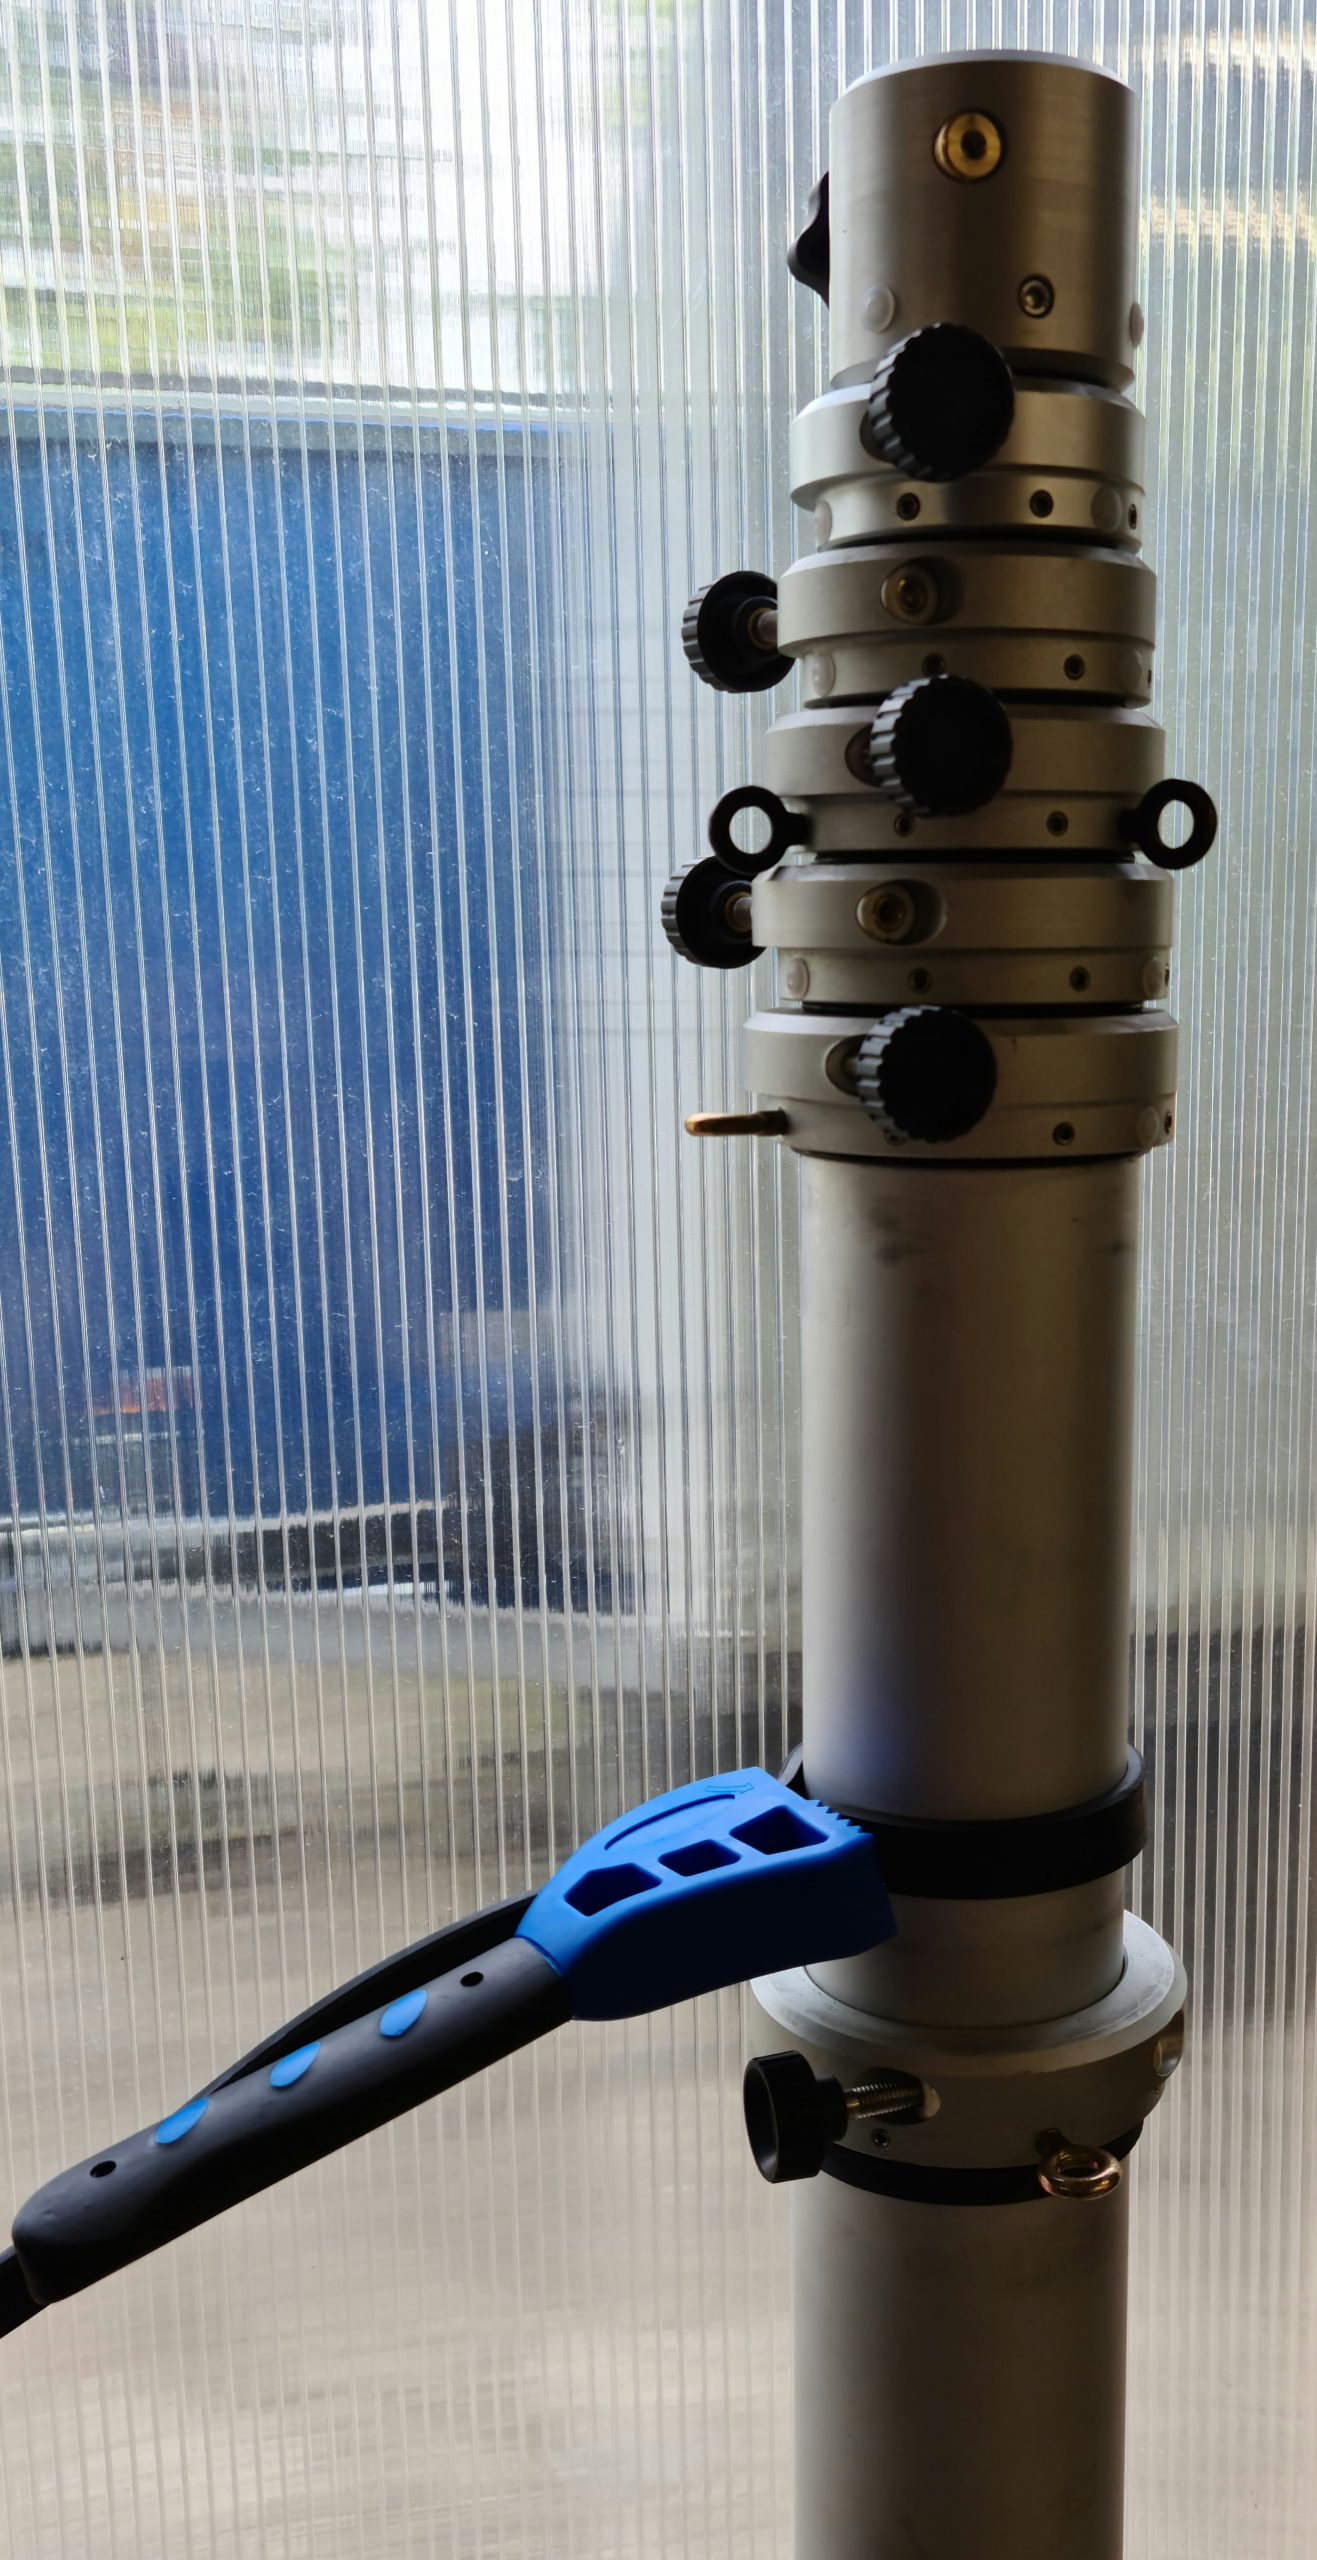 Mast Rotation Handle